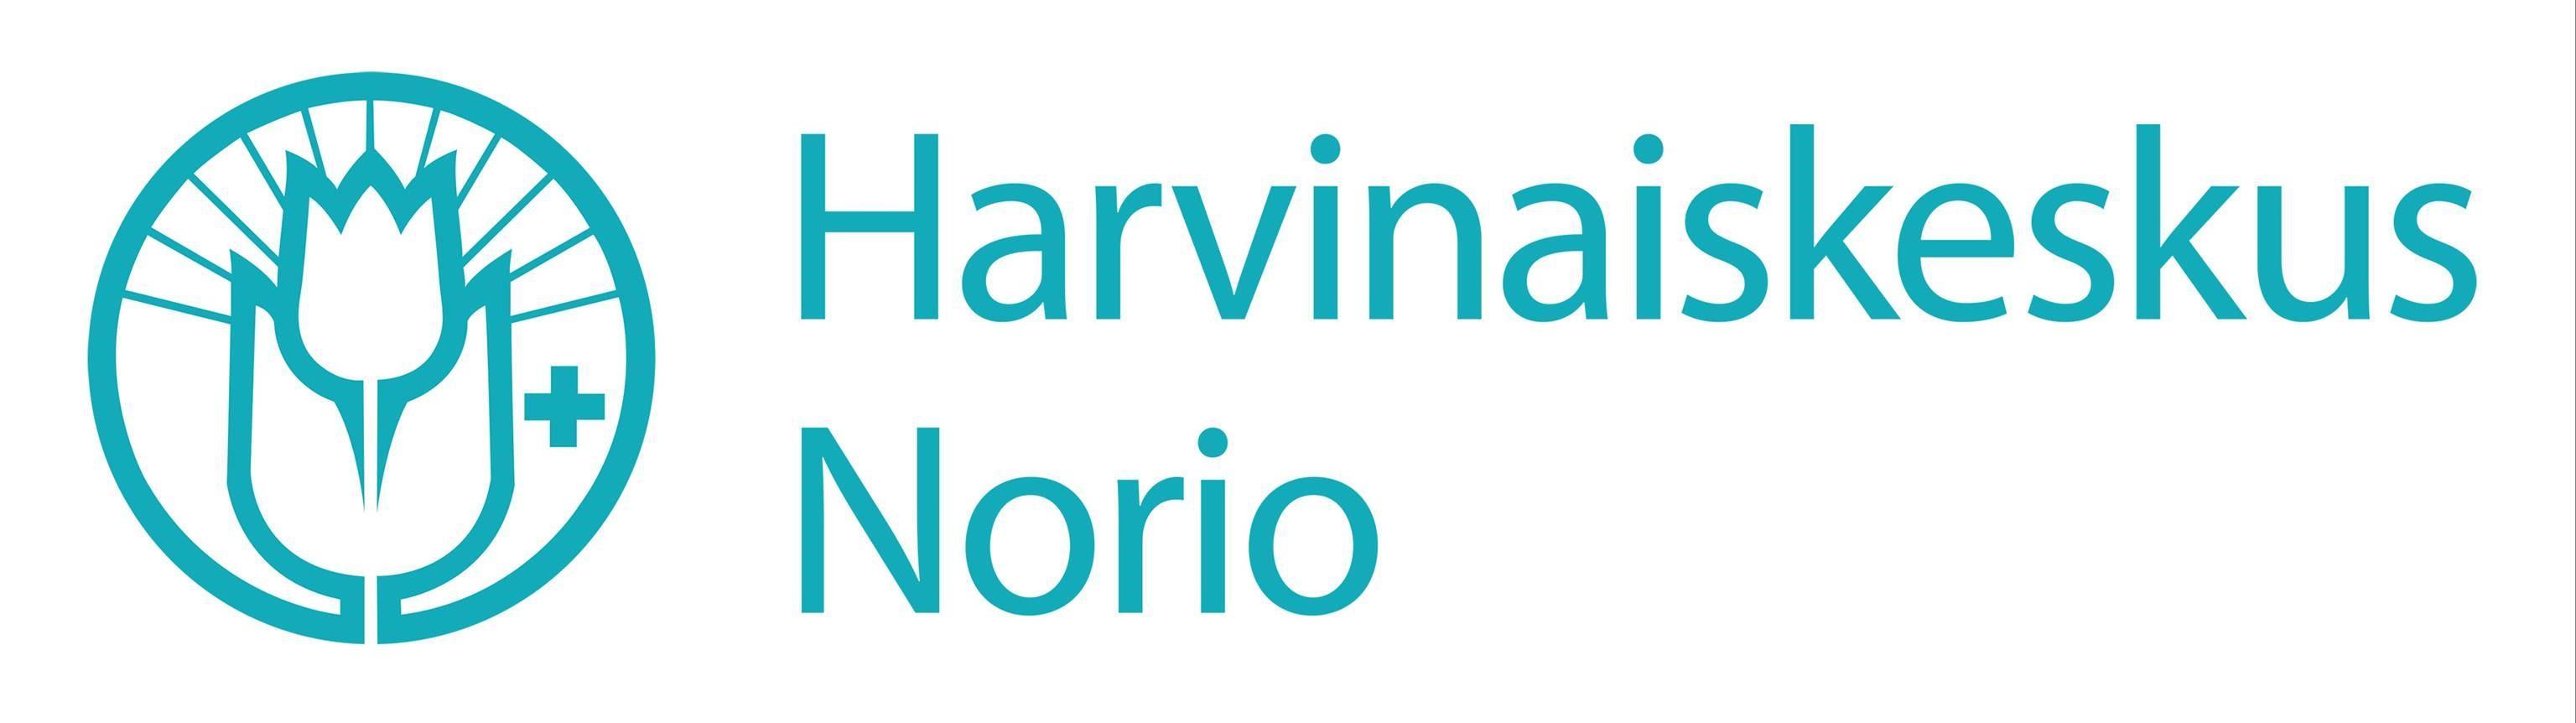 Harvinaiskeskus Norio